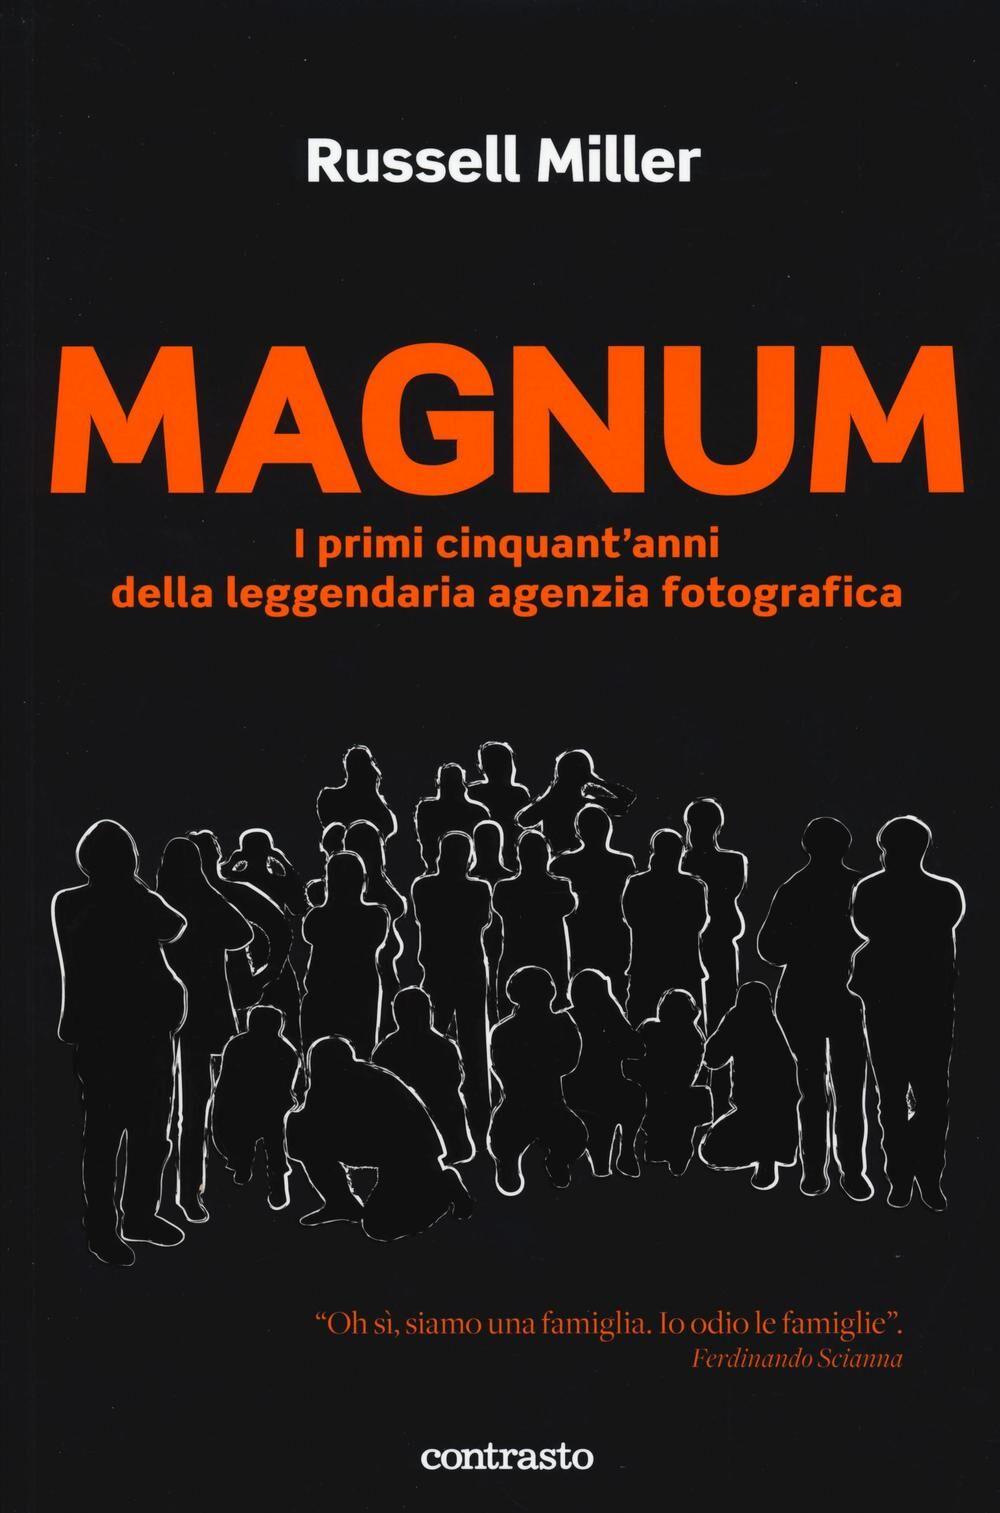 Magnum. I primi cinquant'anni della leggendaria agenzia fotografica